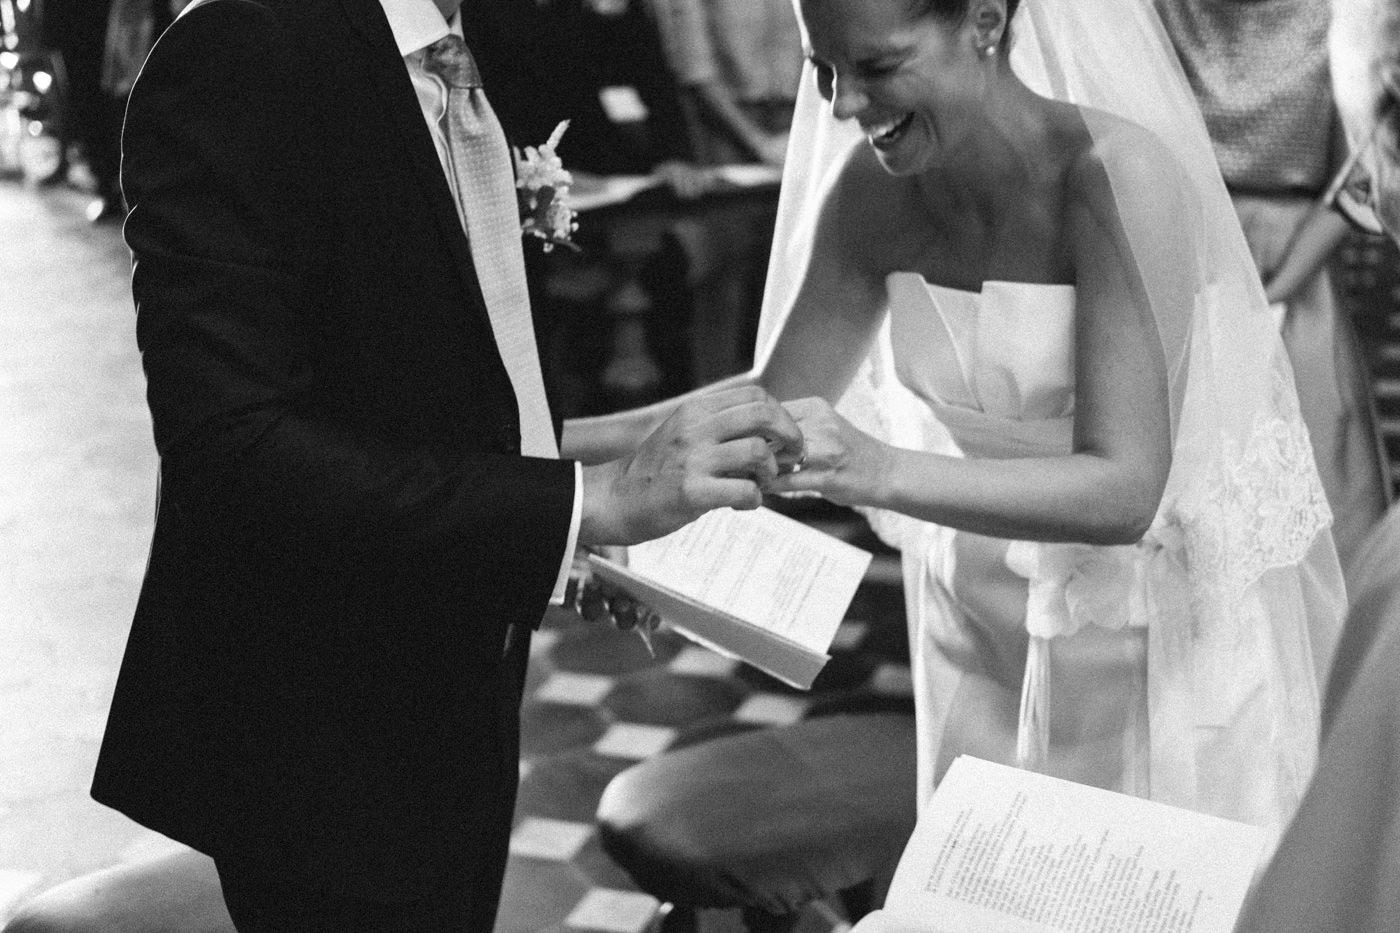 matrimoni_all_italiana_fotografo_matrimonio_cinque_terre-22.jpg